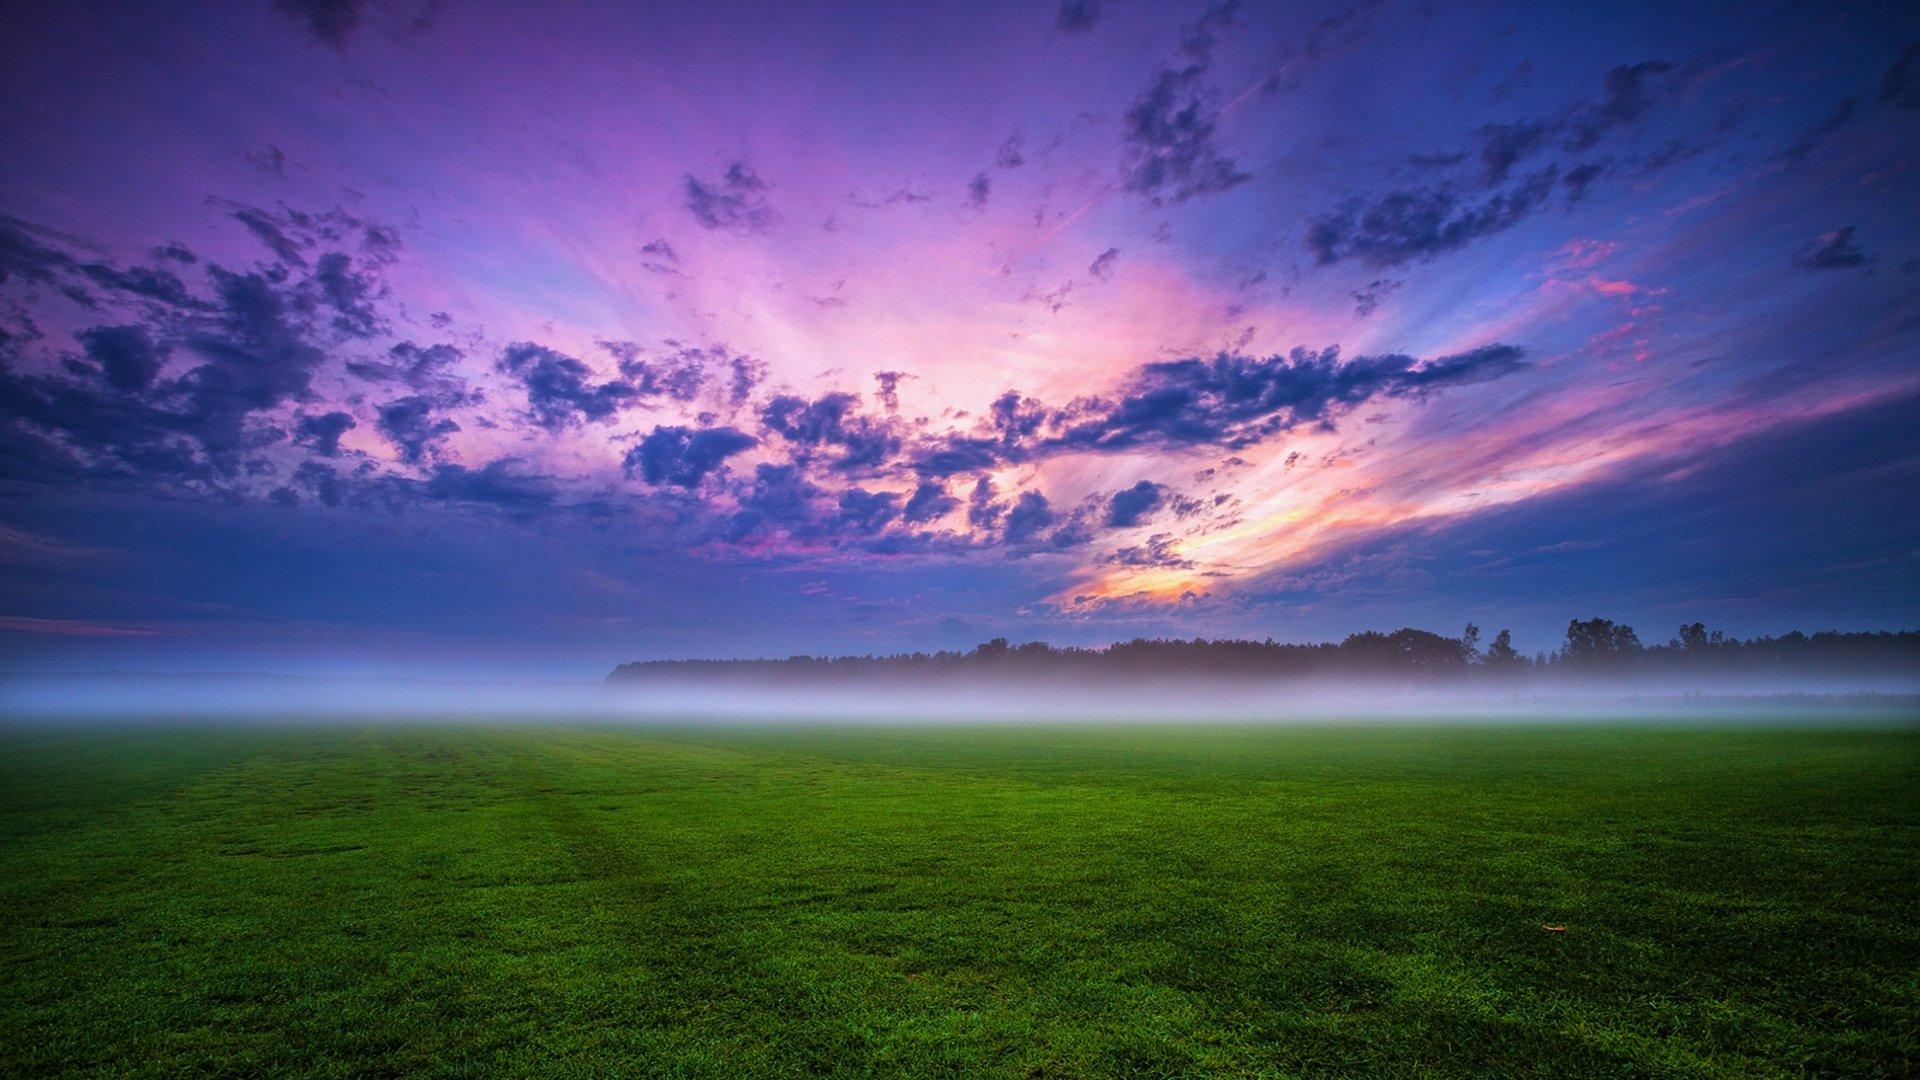 Earth - Field  Grass Cloud Sunrise Earth Nature Landscape Fog Wallpaper